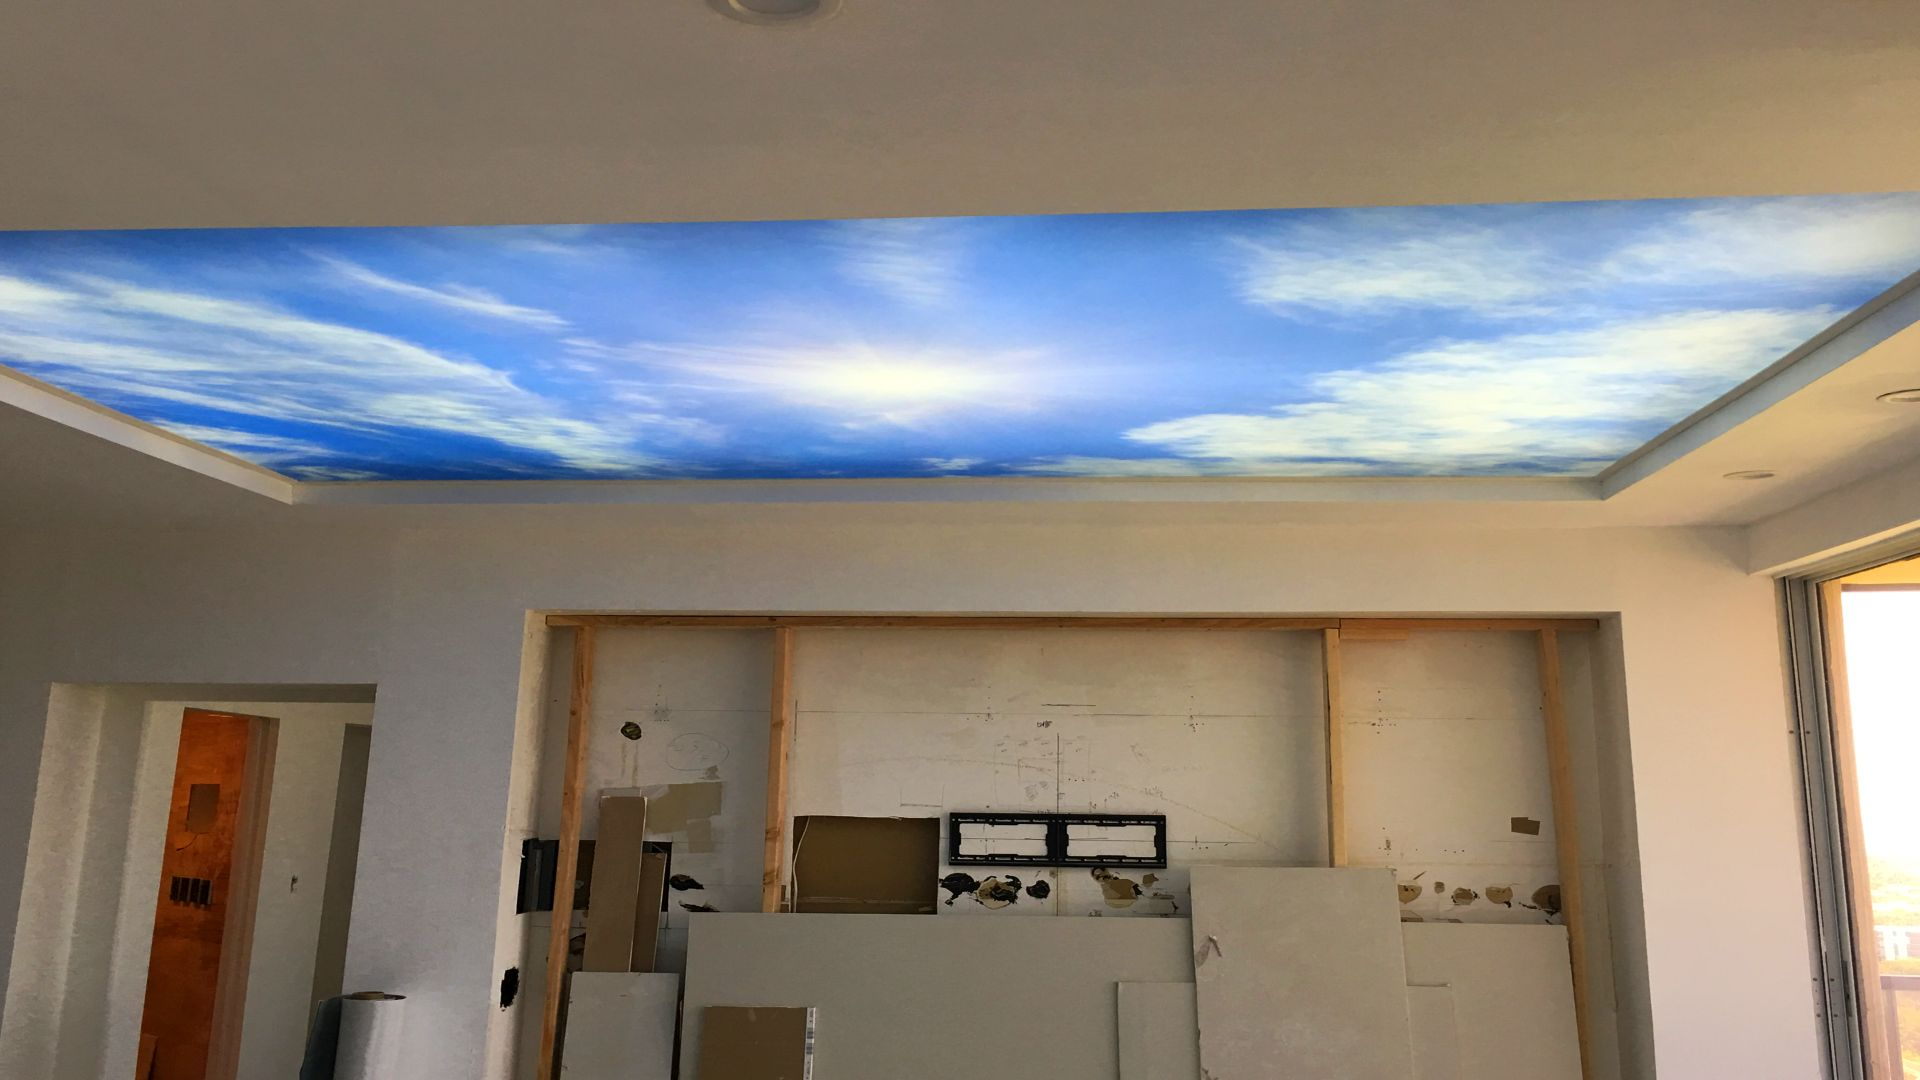 miami printed glossy ceiling n°1